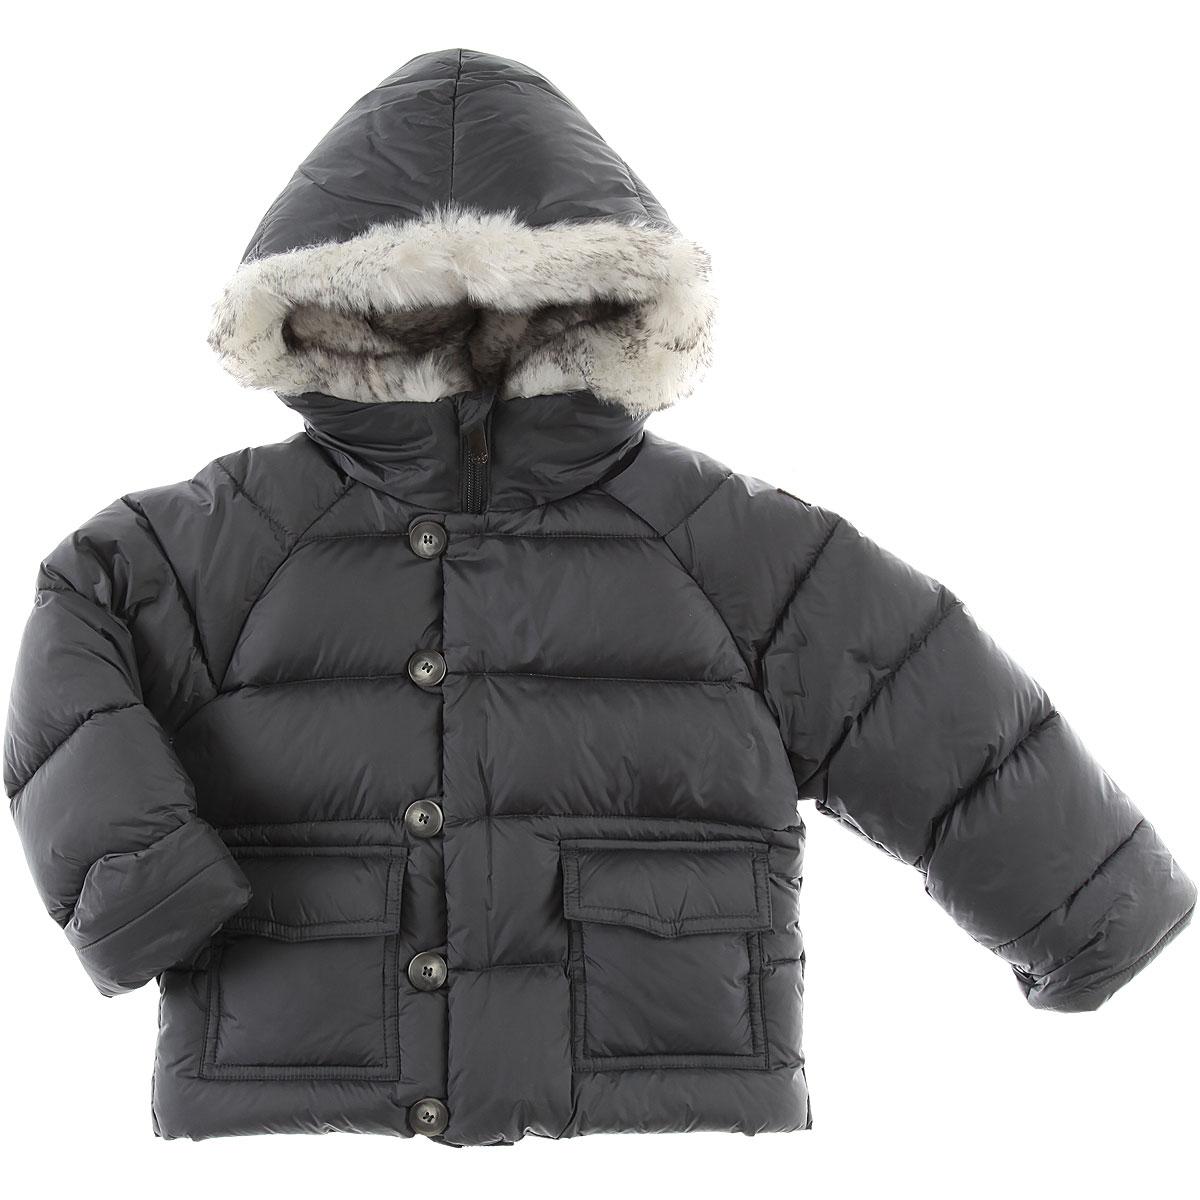 Image of Il Gufo Baby Down Jacket for Boys, Grey, polyamide, 2017, 12M 18M 2Y 6M 9M